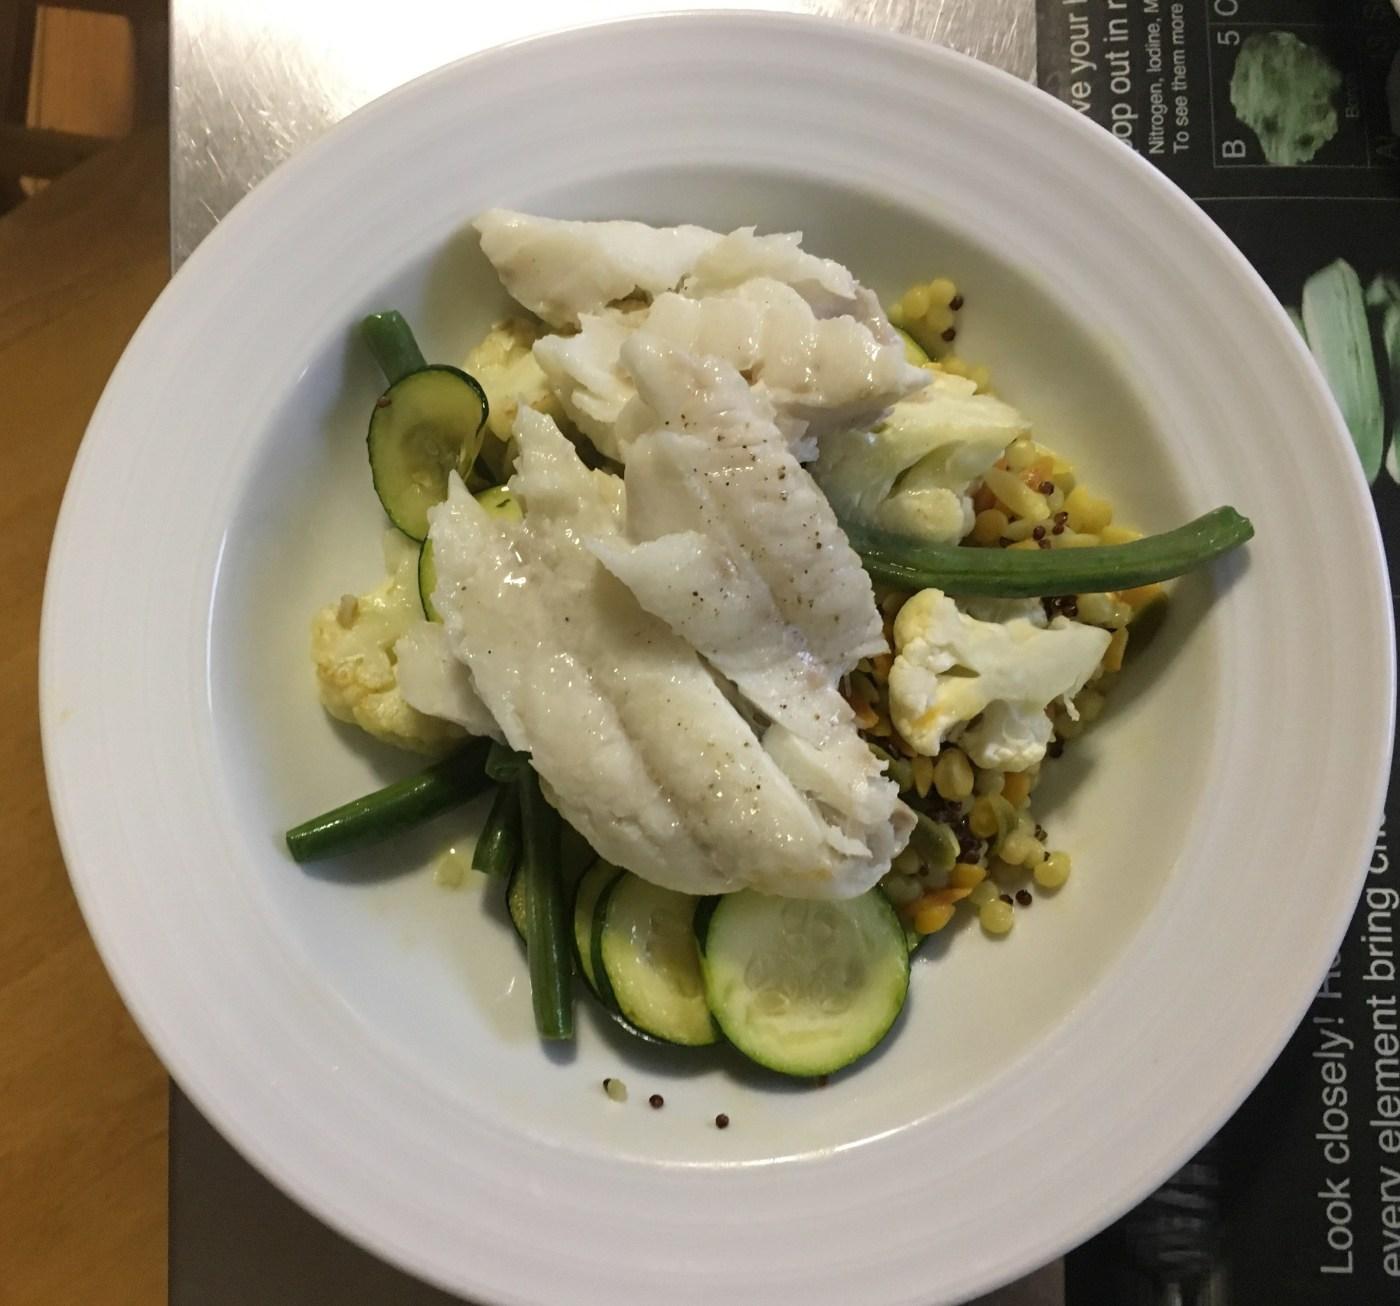 Braised fish over cous cos, beans, cauliflower & zucchini